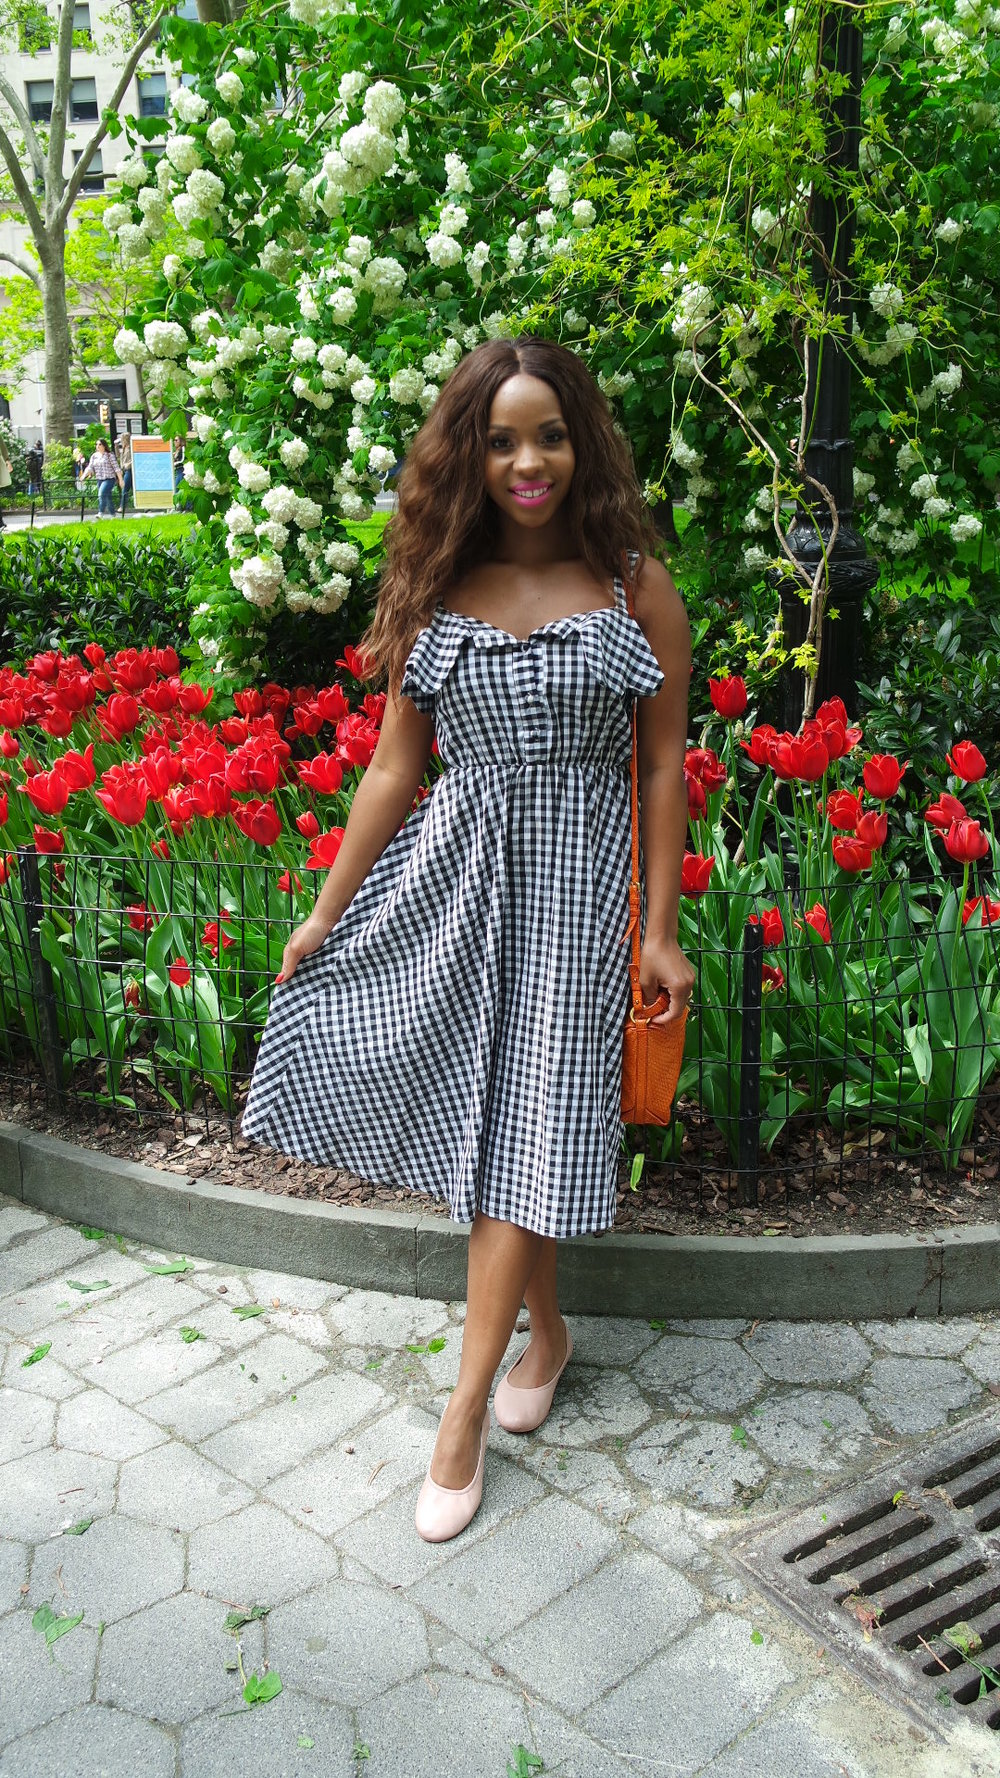 Gingham Dress Summer Park